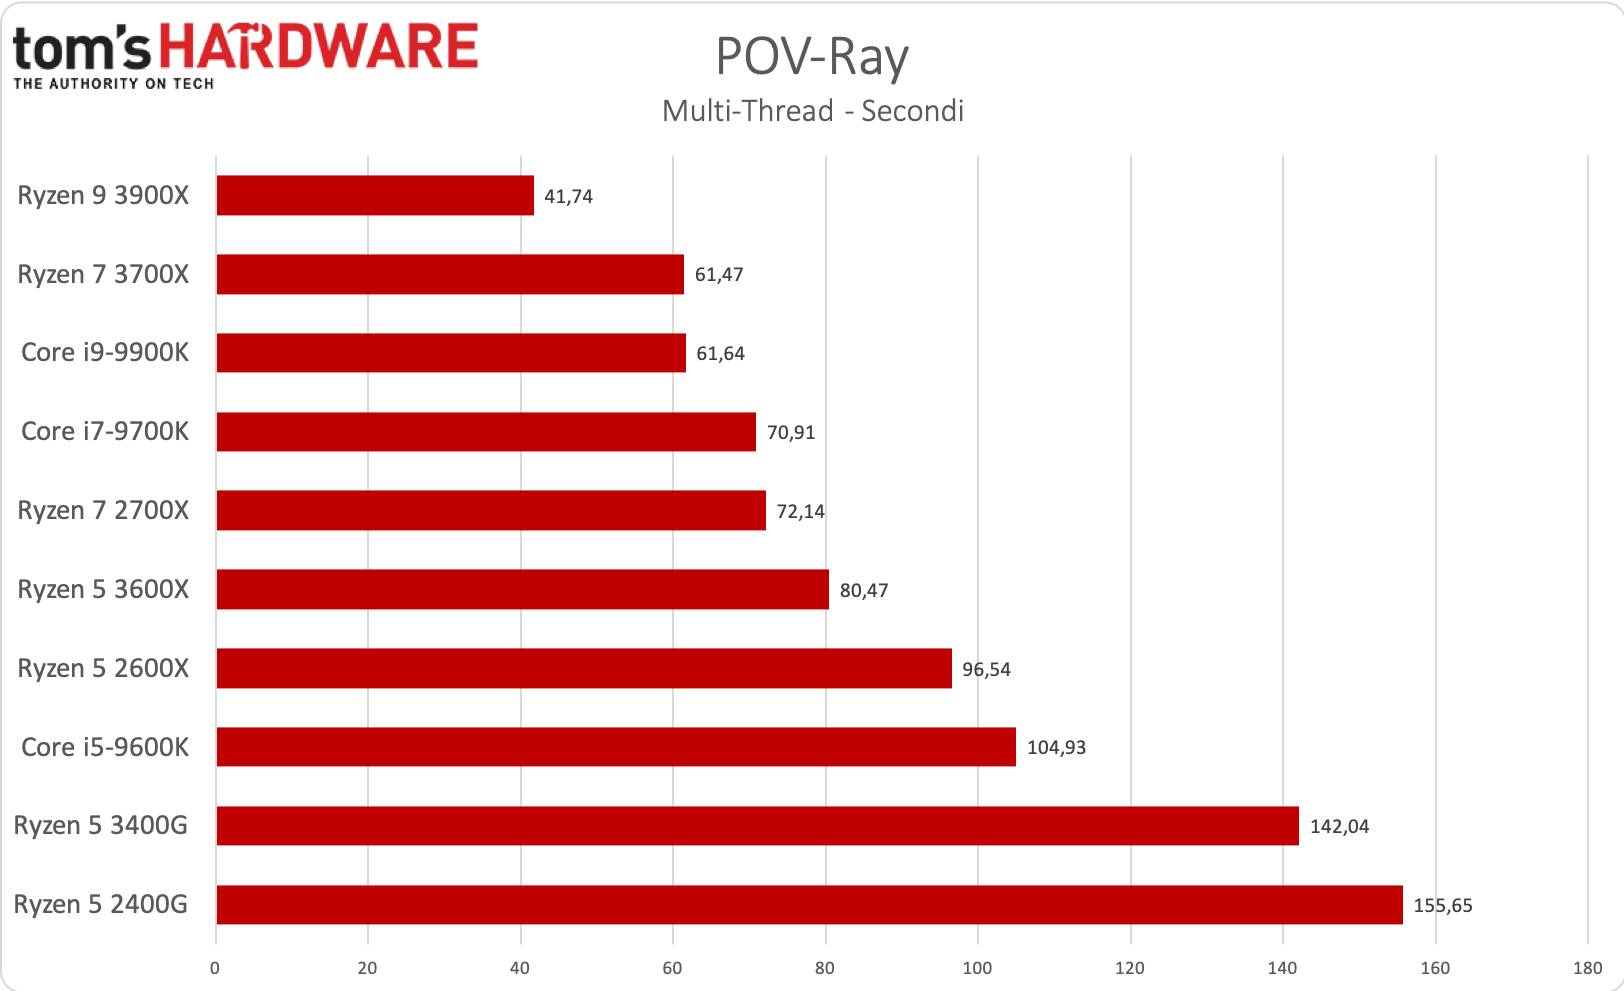 Ryzen 5 3400G - POV-Ray multi-thread